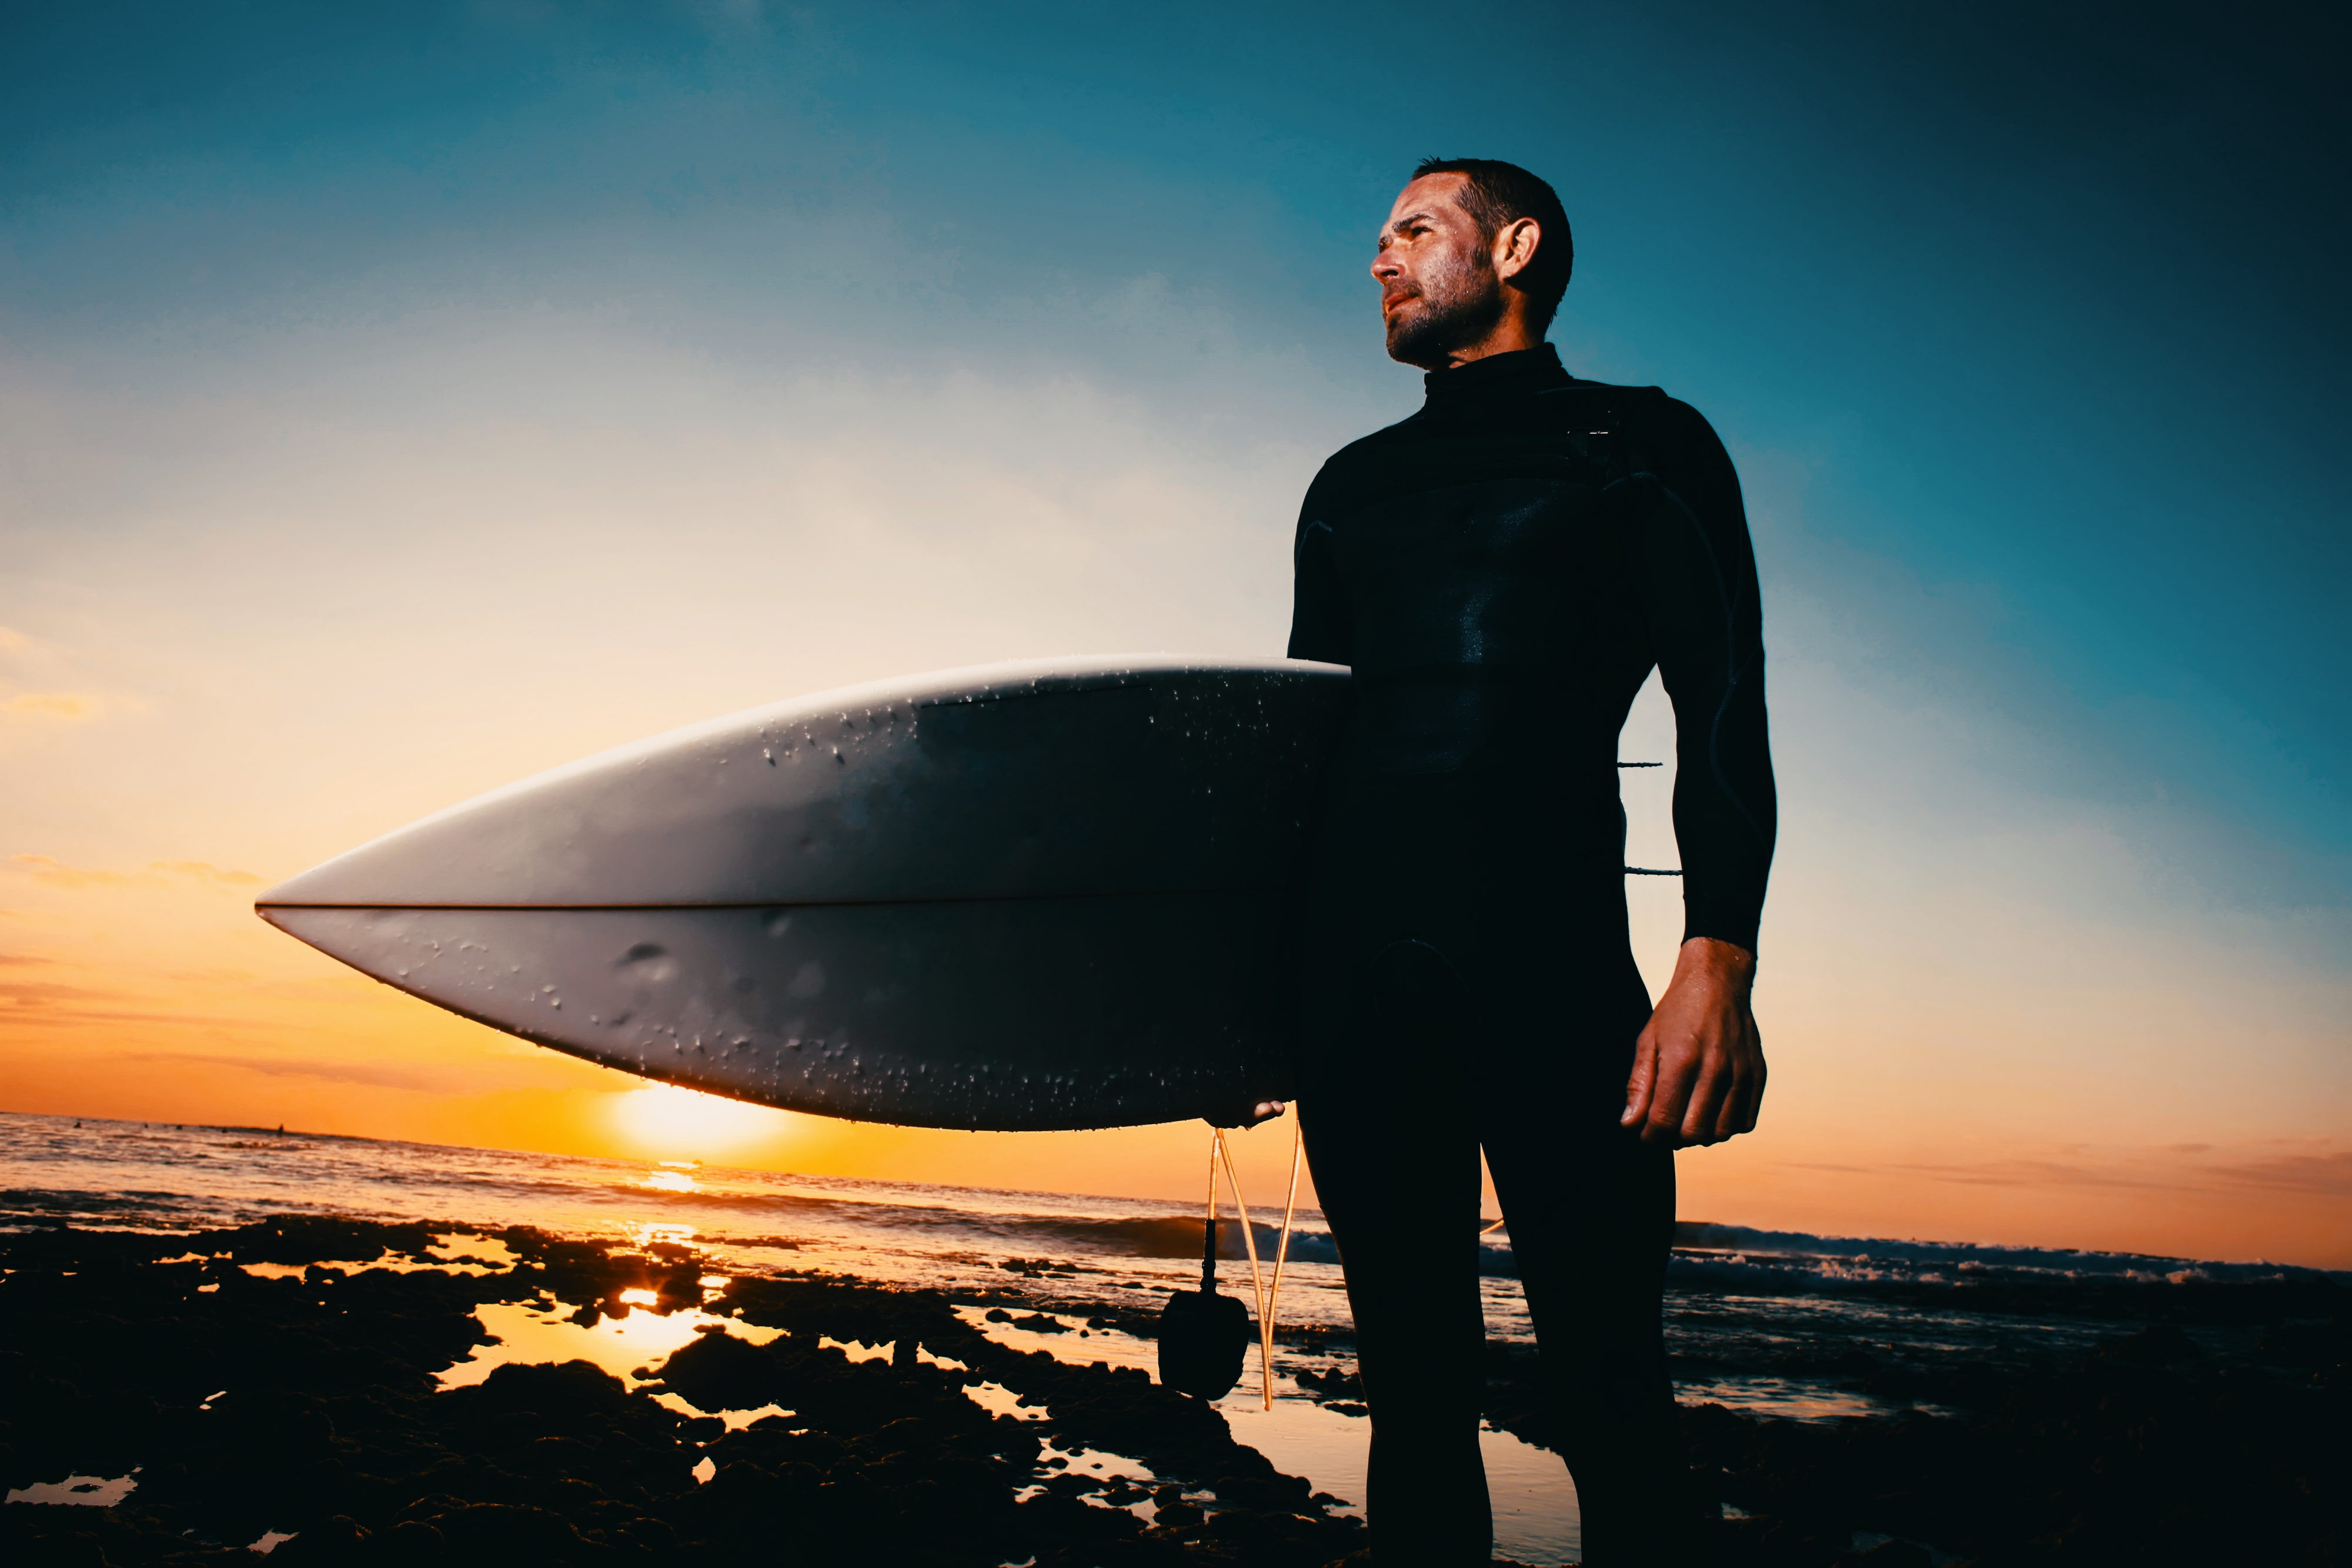 Surfer in Teneriffa